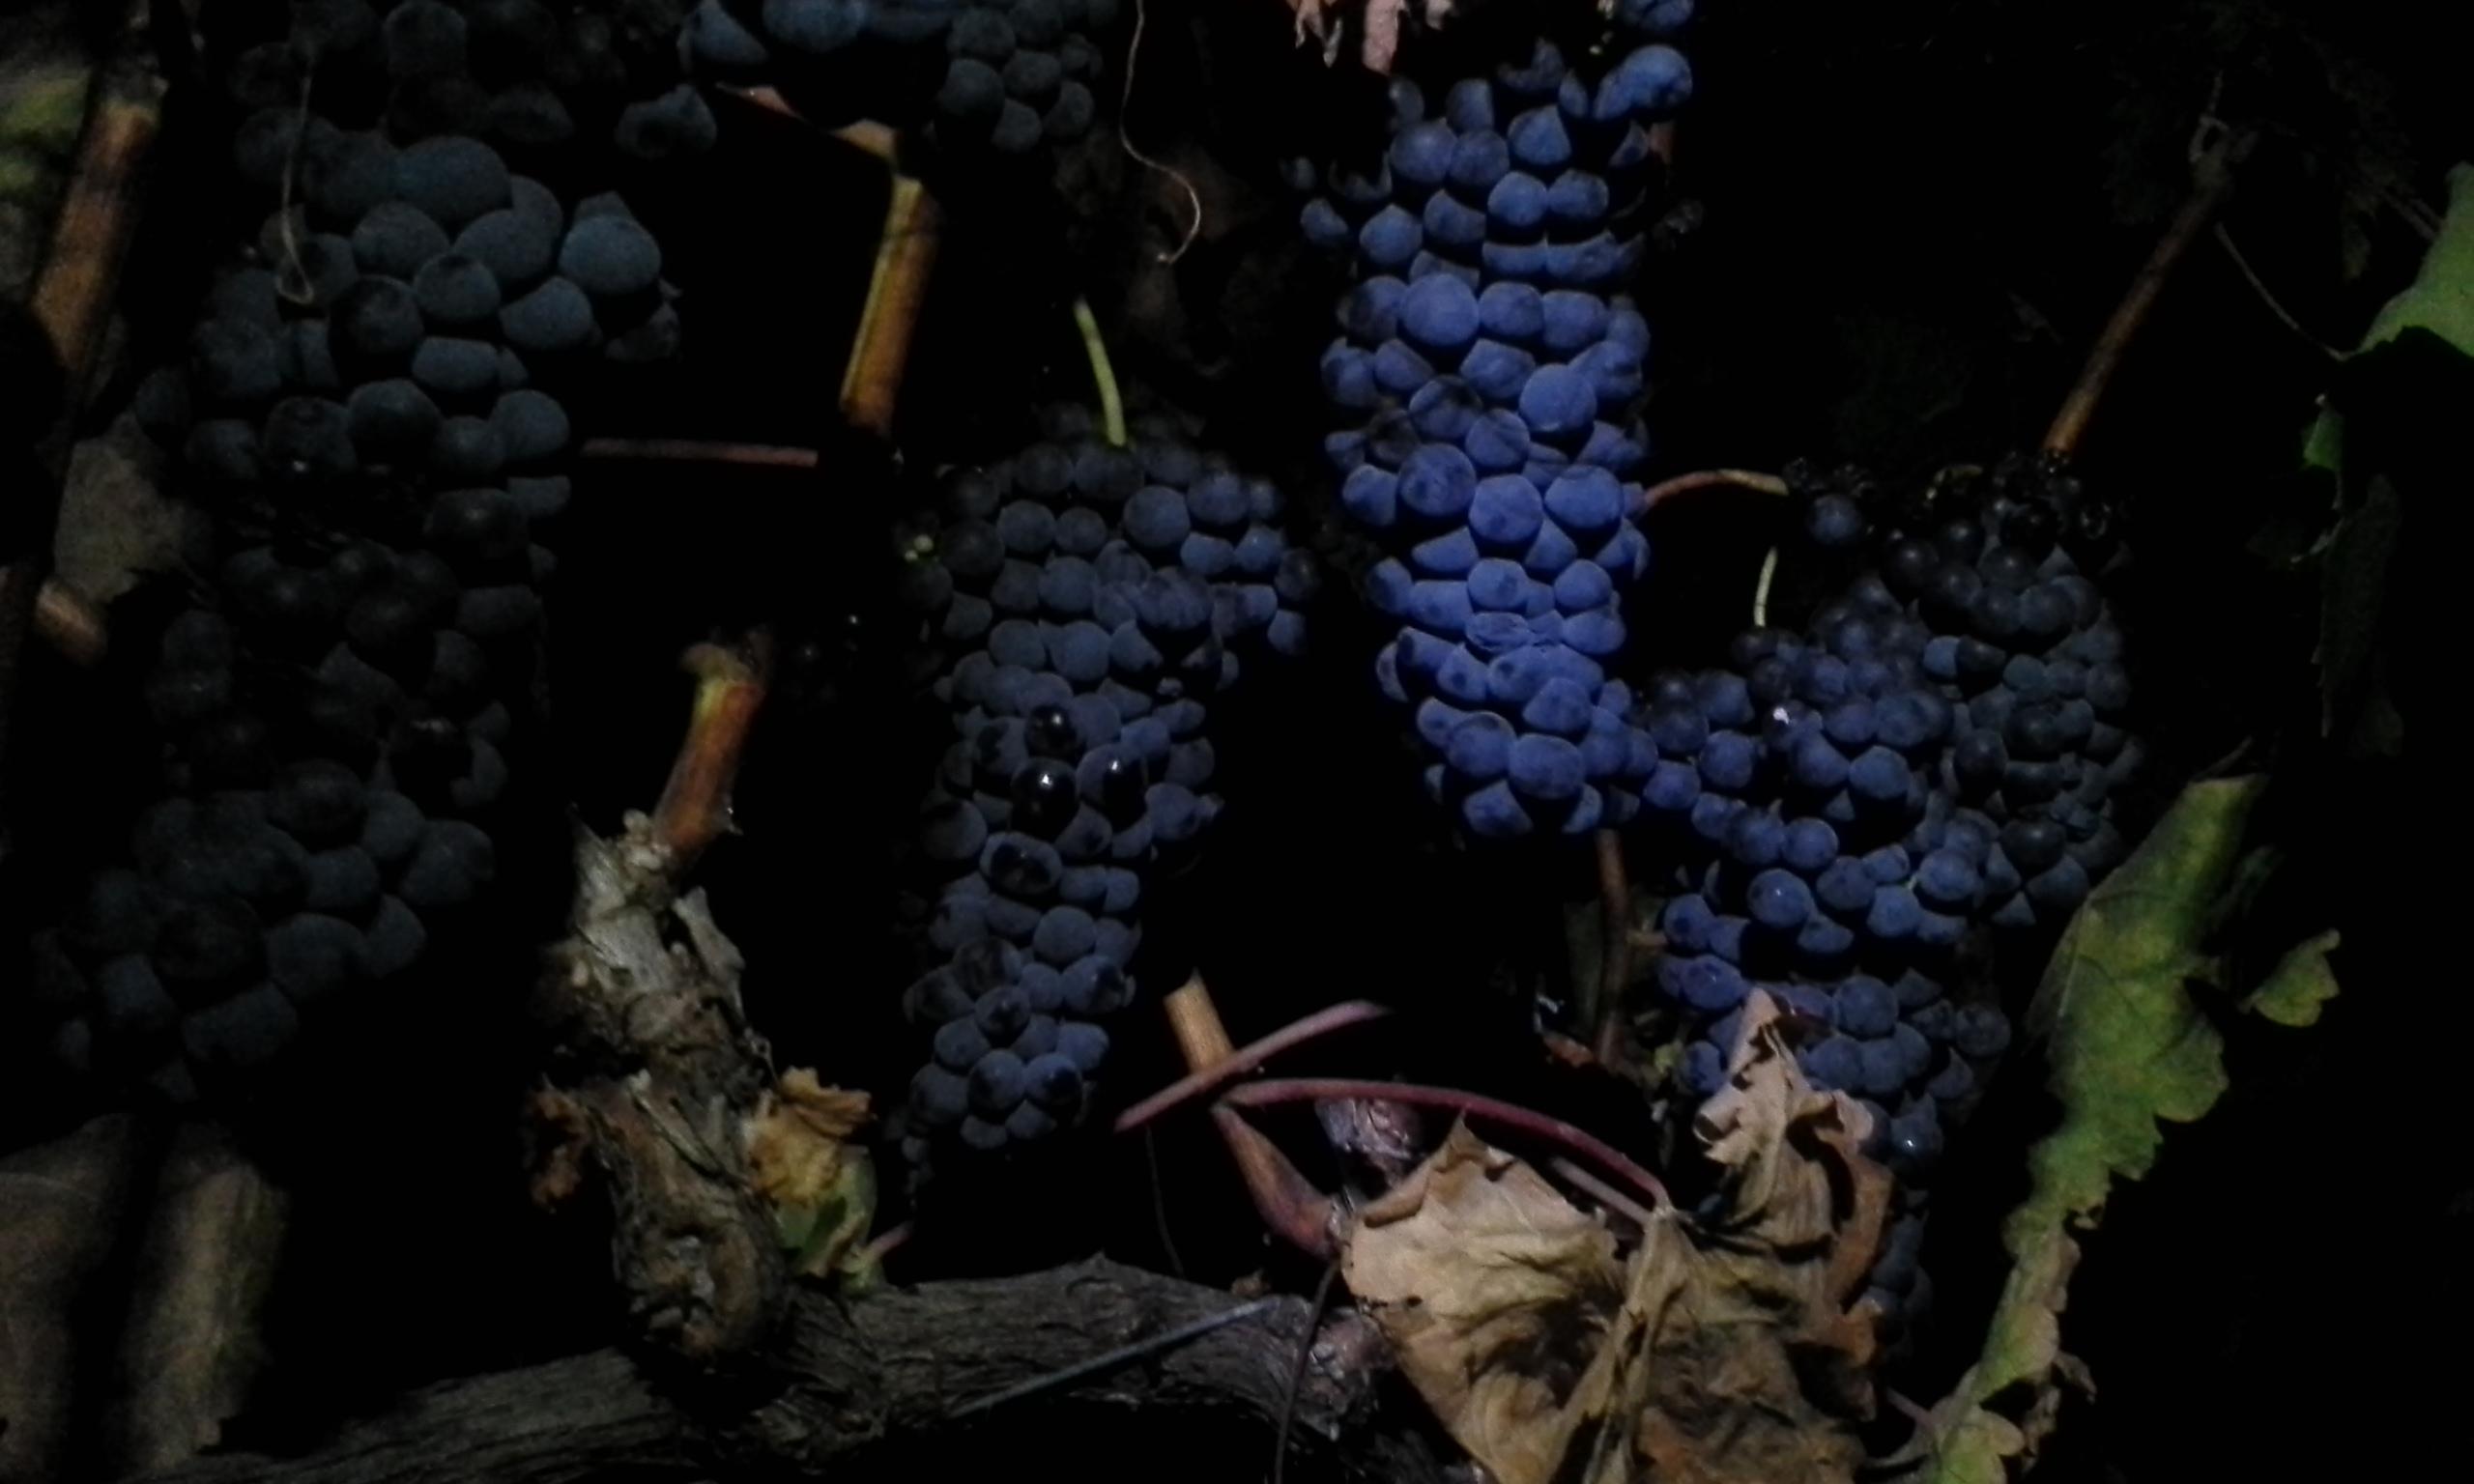 Night Grapes